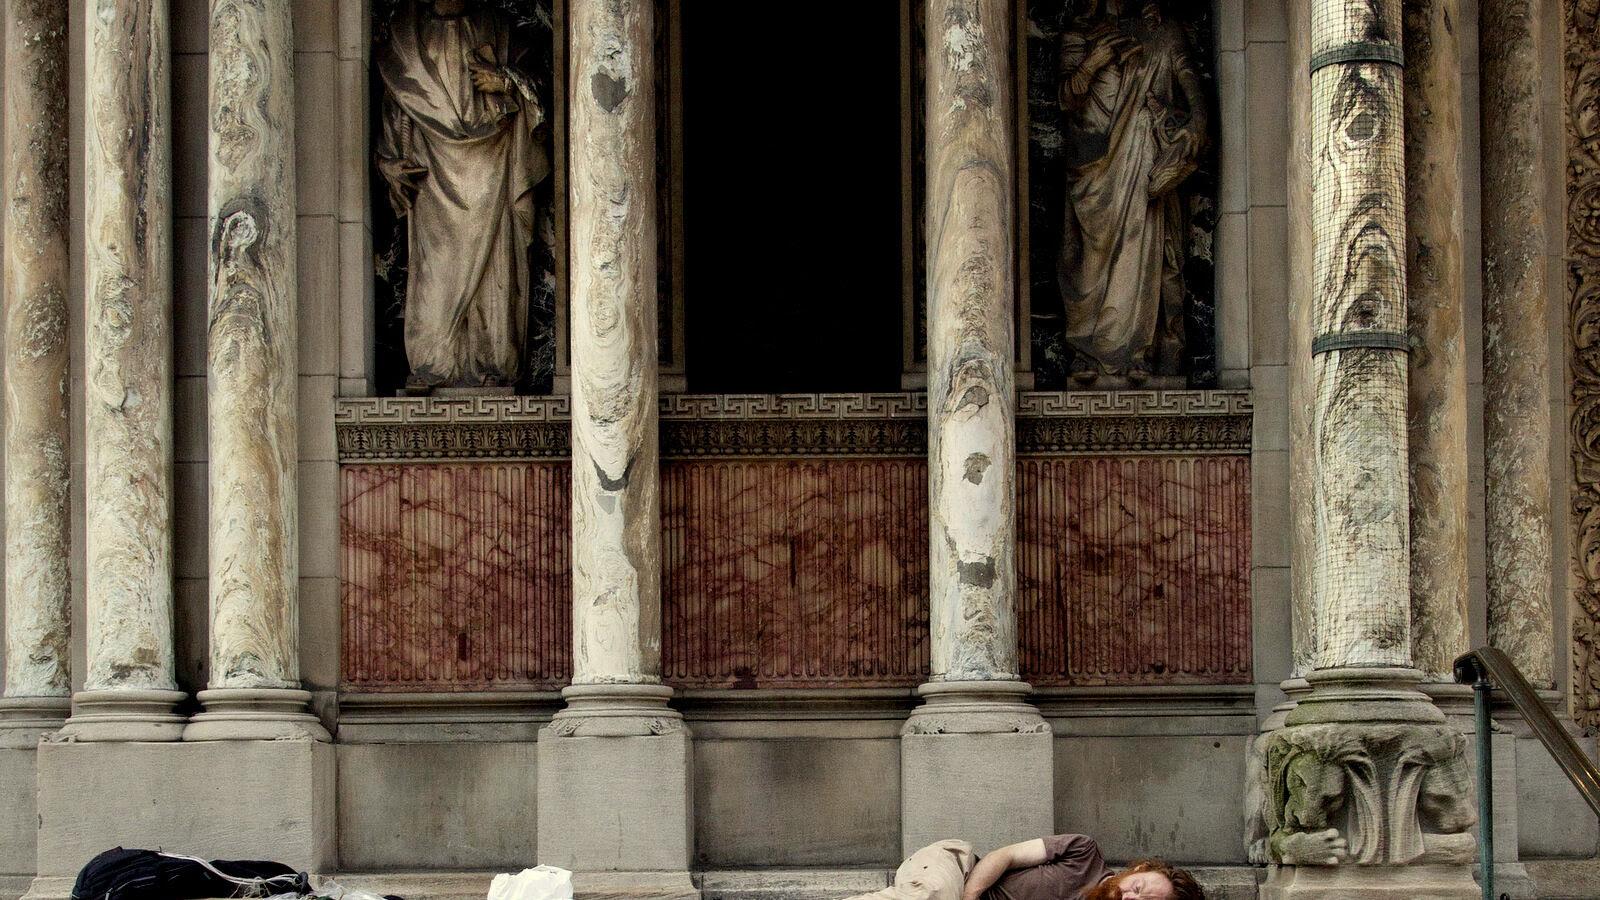 A Homeless man sleeps on the steps of St. Bartholomew's Church